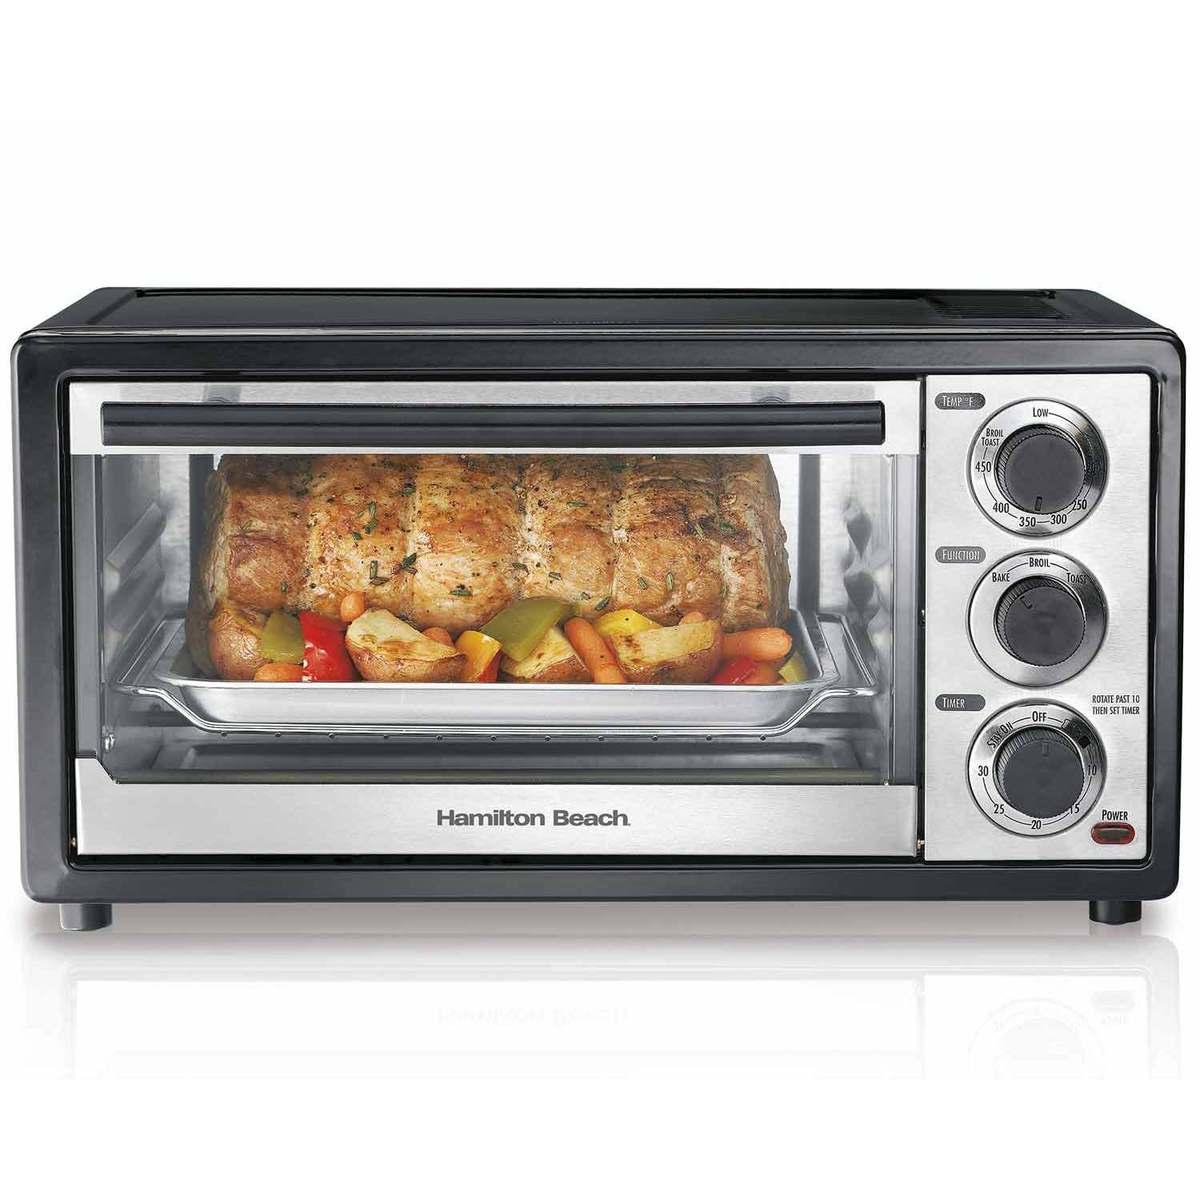 6 Slice Capacity Toaster Oven (31508)